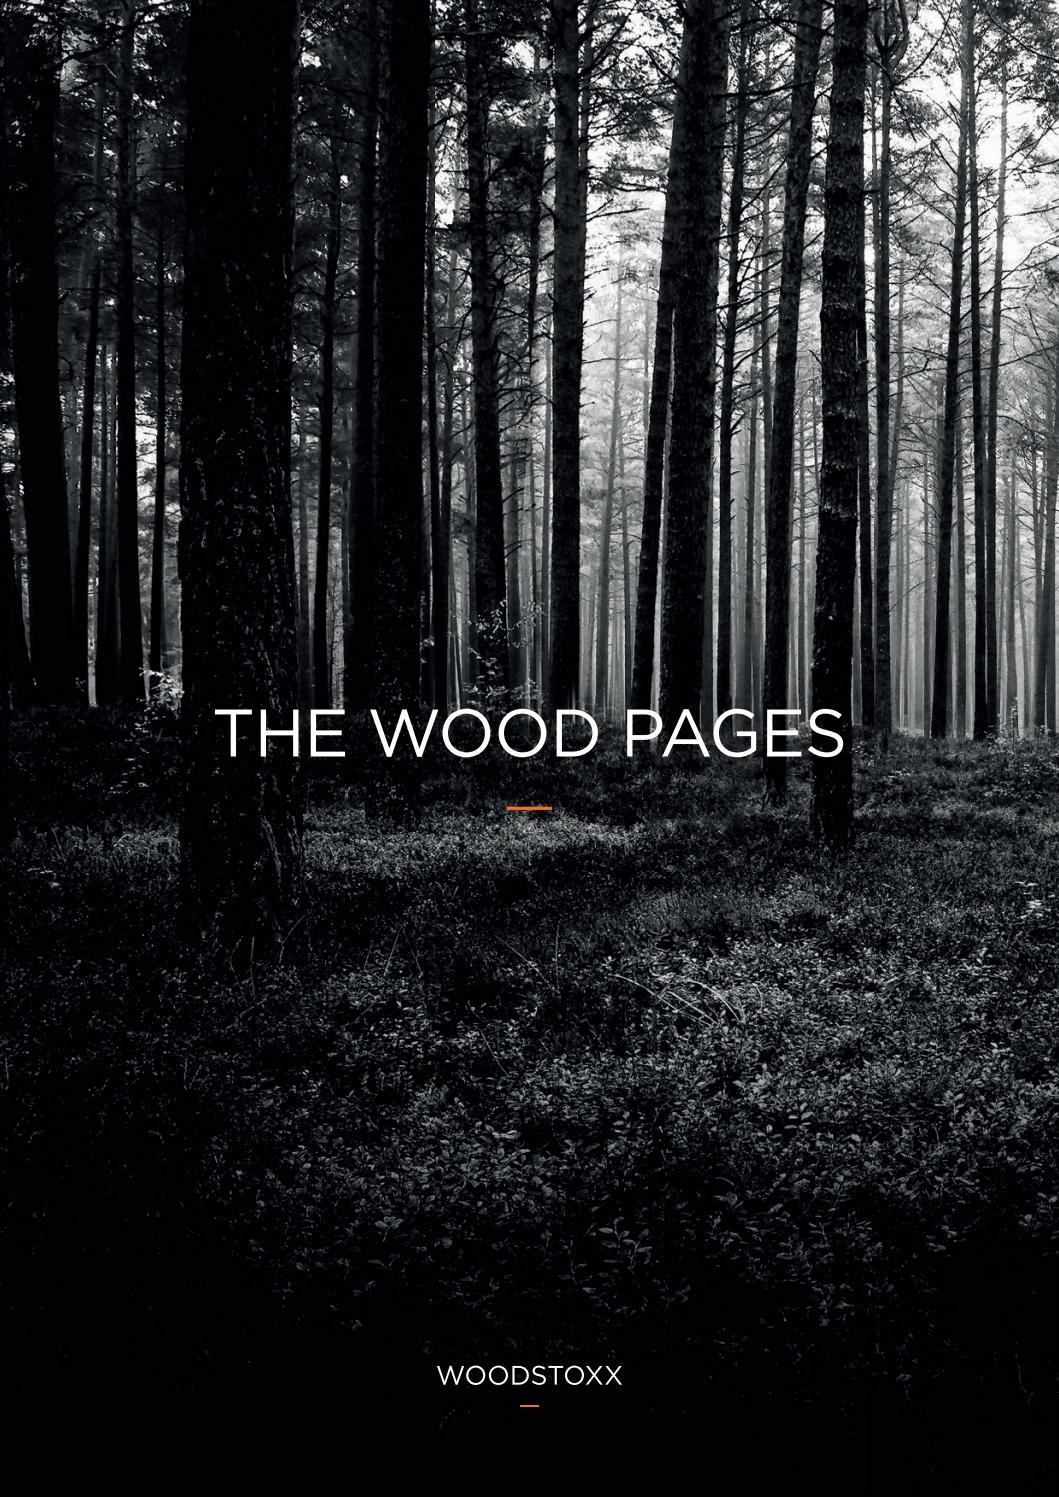 Contreplaqué Bambou 3 Mm woodpages wxx #3 frwoodstoxx - issuu